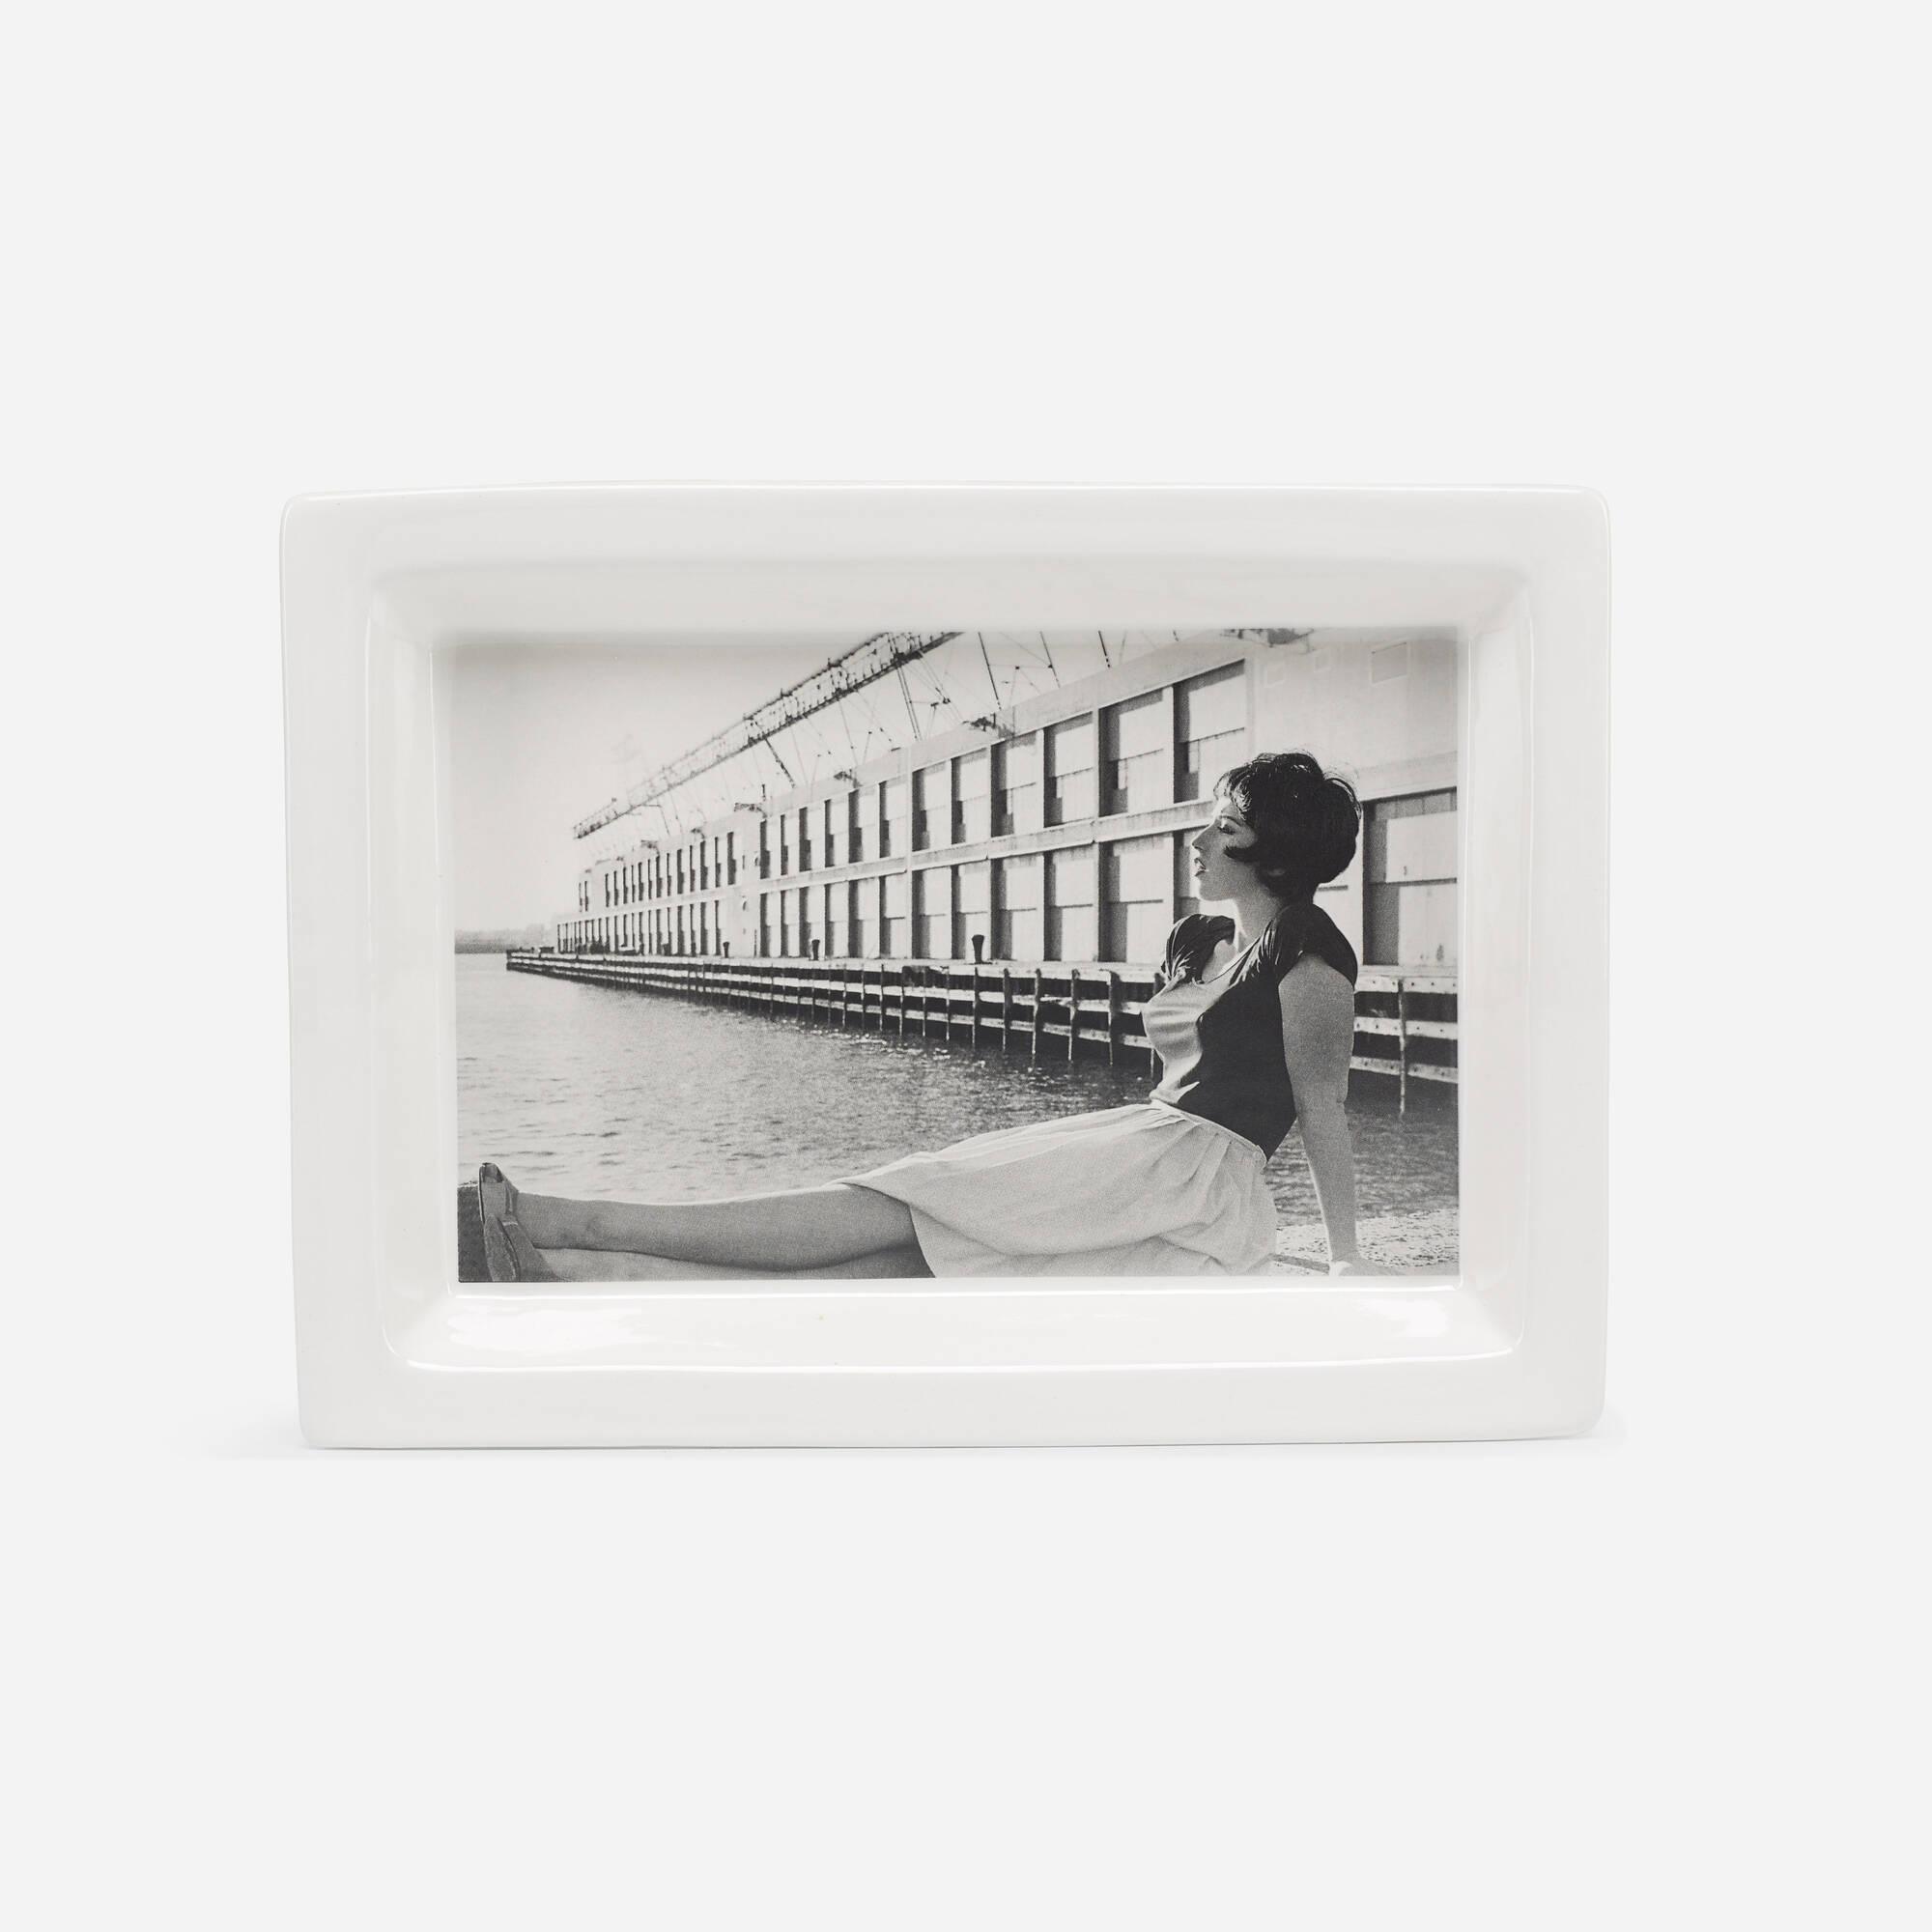 727: Cindy Sherman / Untitled Film Still tray (1 of 2)